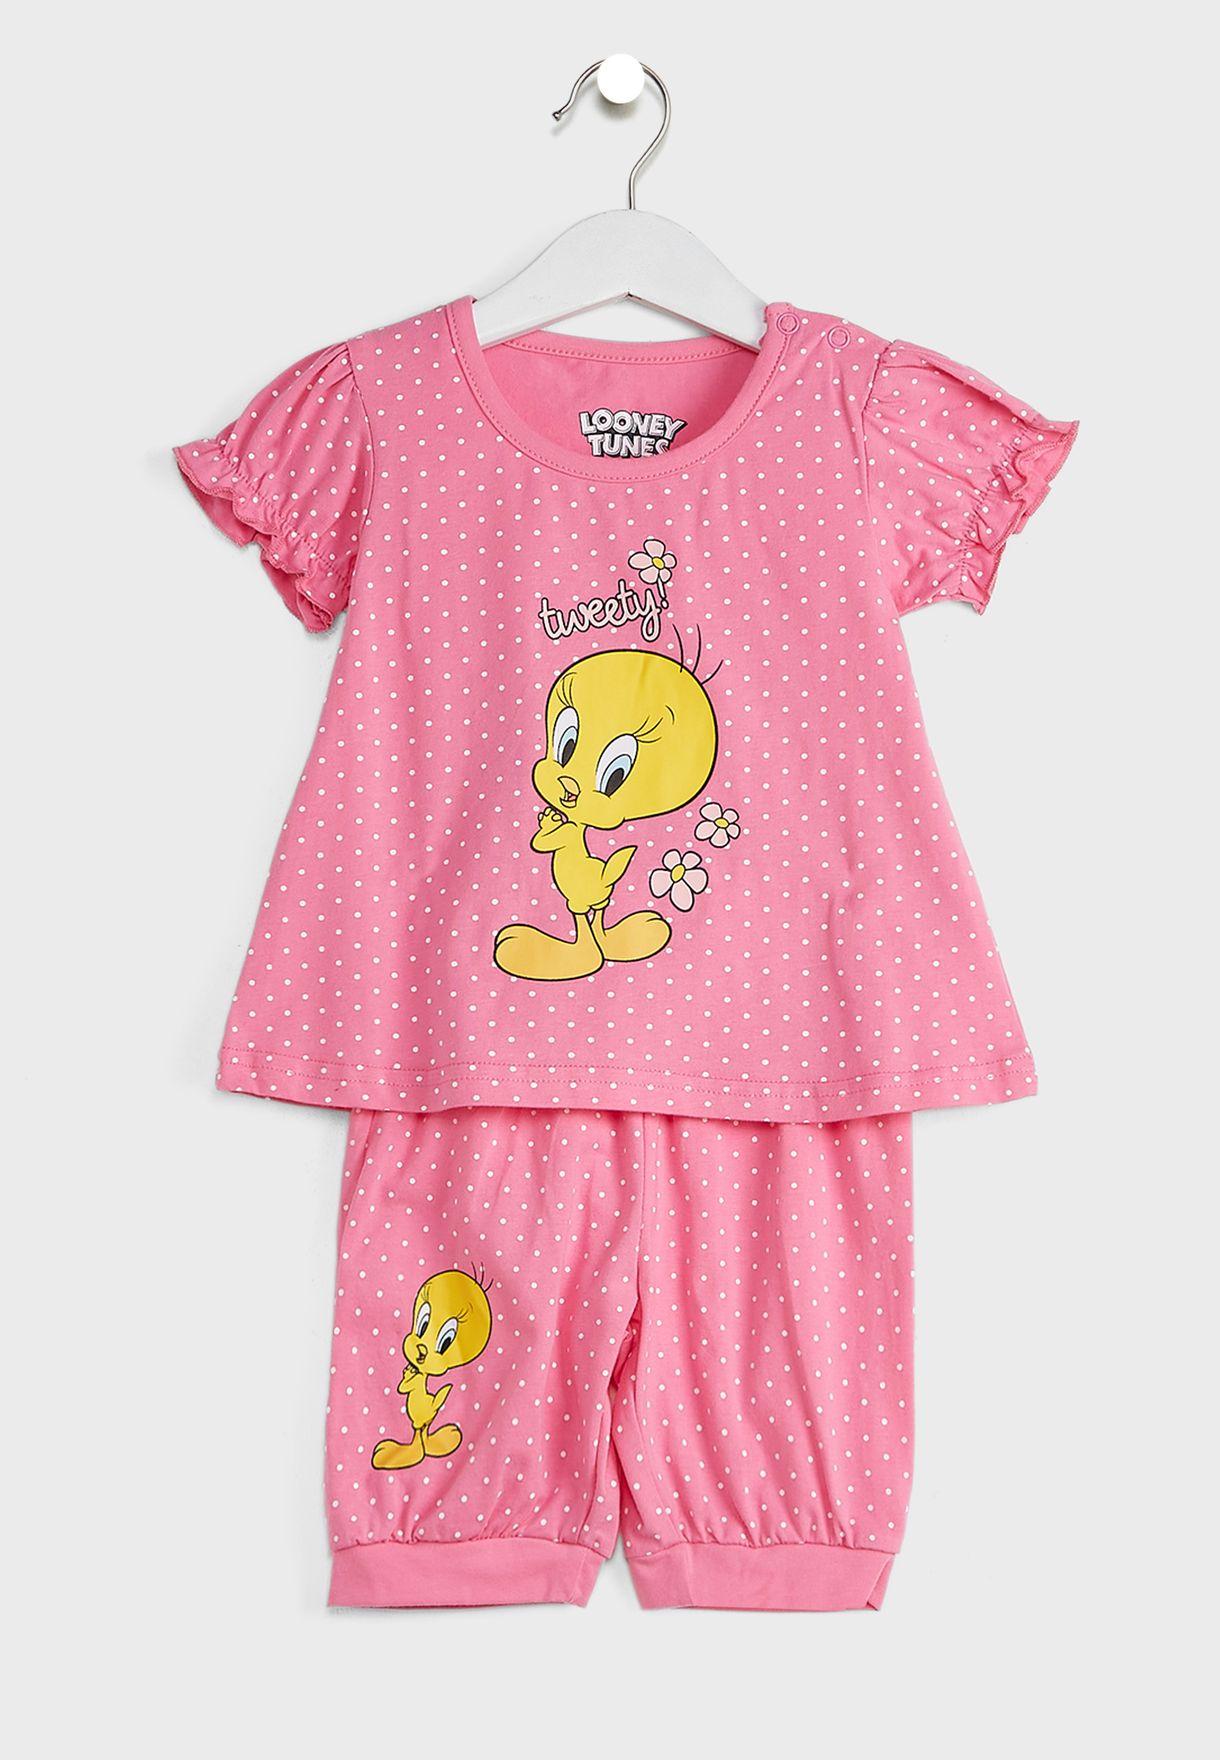 Infant Tweety Top + Shorts Set